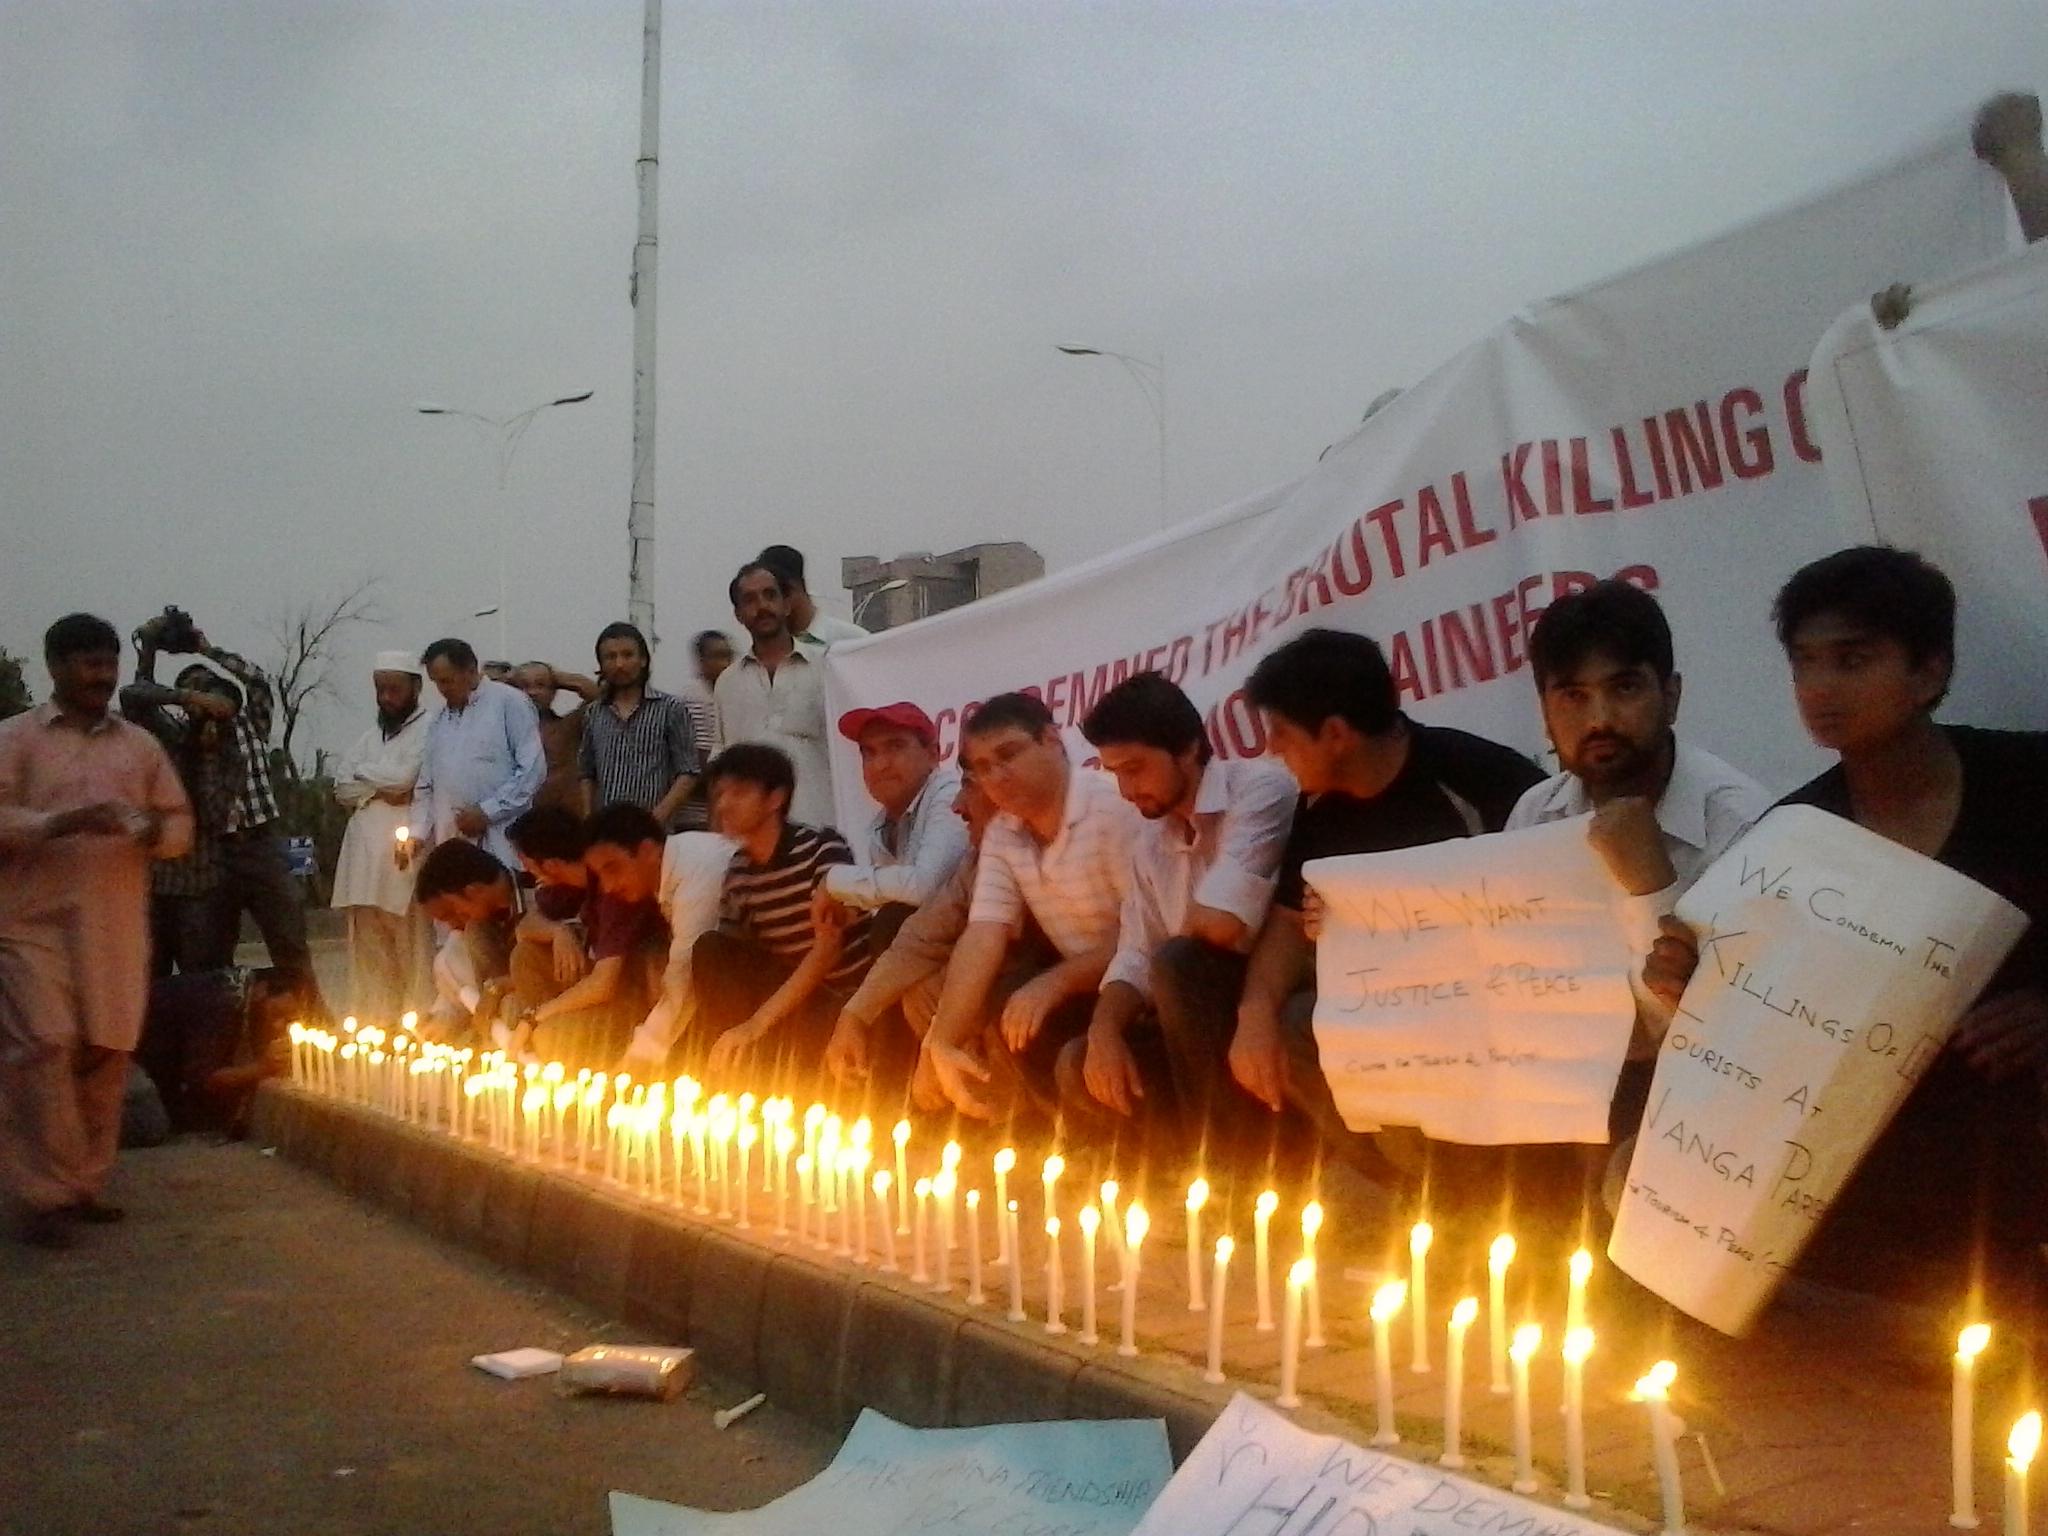 Islamabad: Candle light vigil held in memory of tourists slain near Nanga Parbat base camp